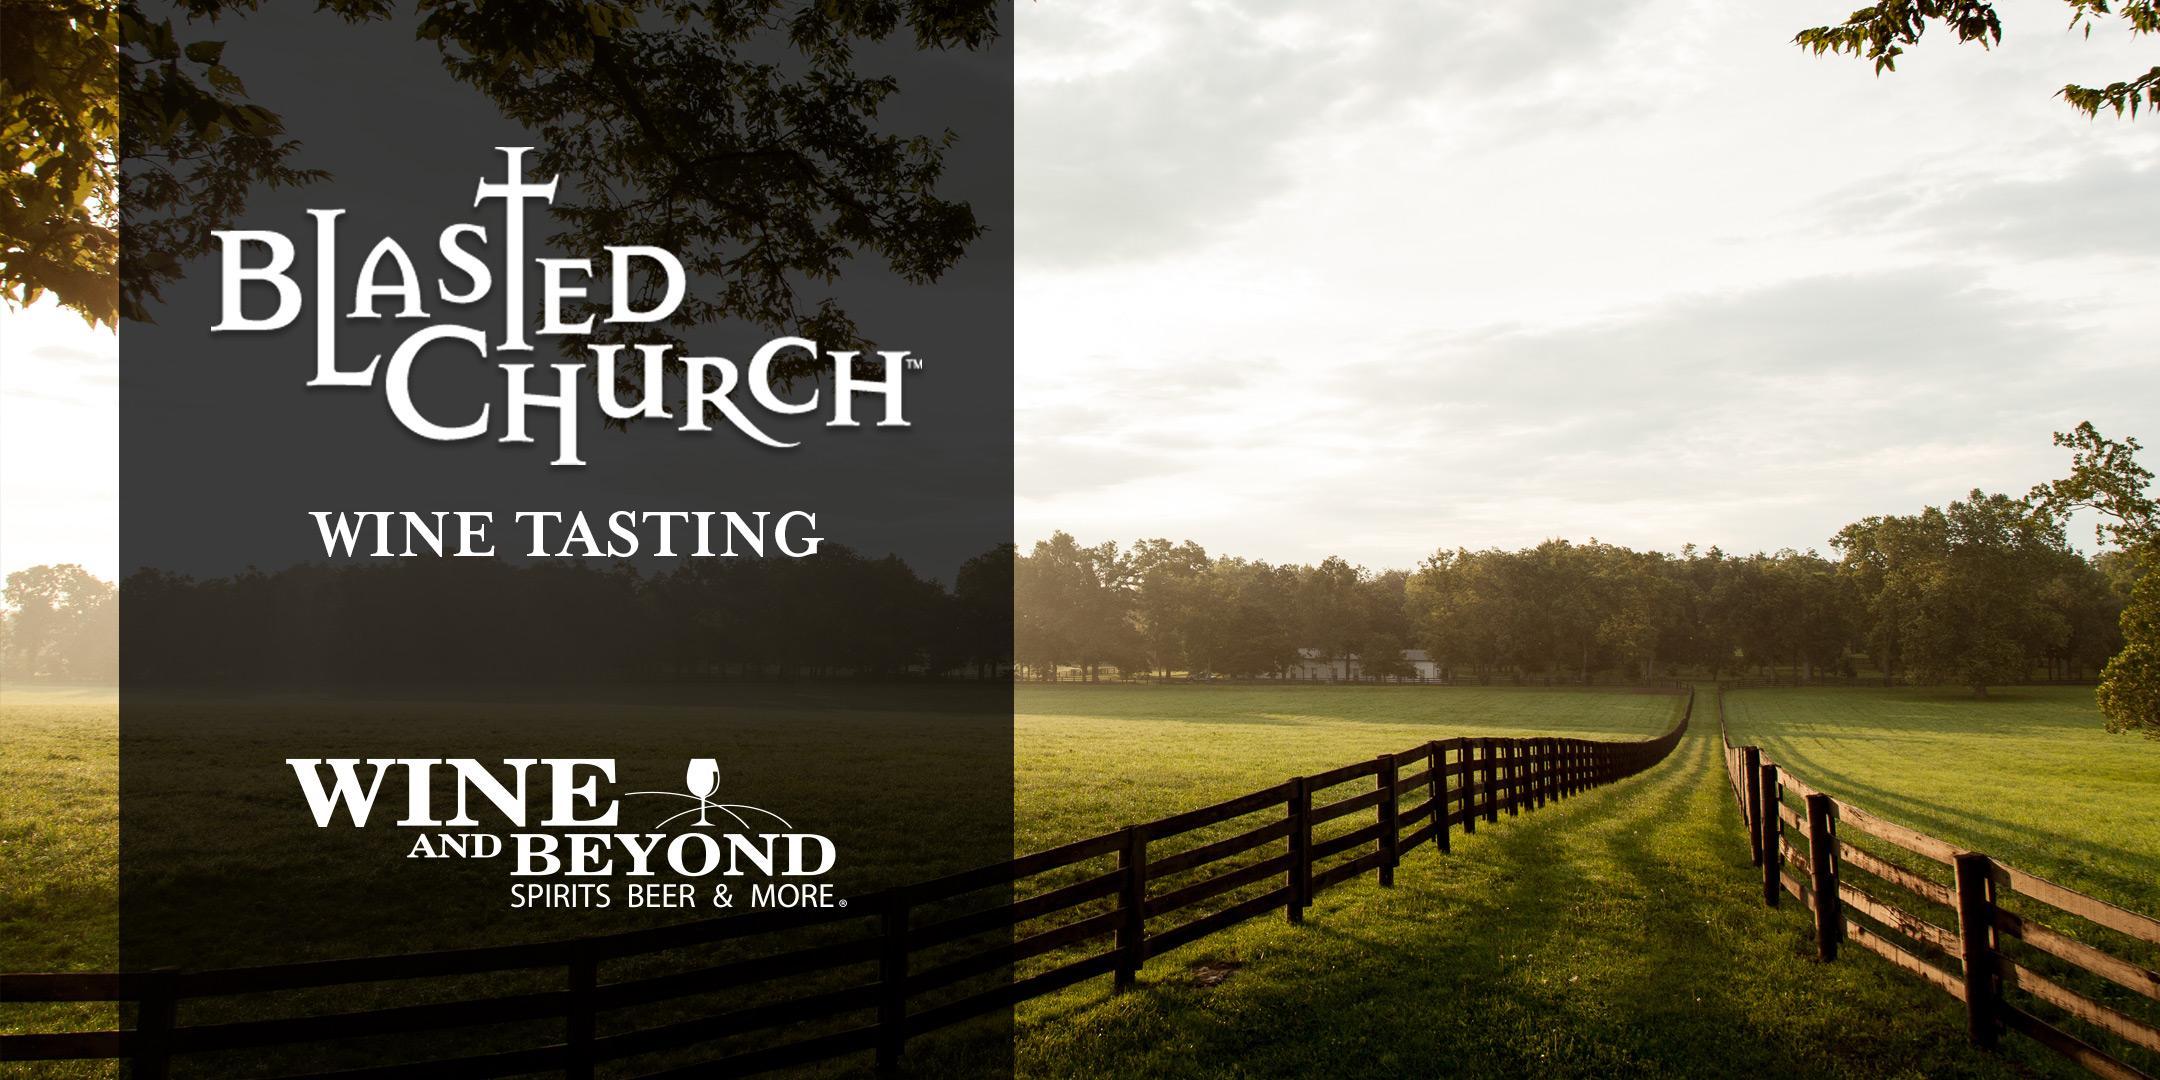 Heaven Sent! Blasted Church Wine Tasting